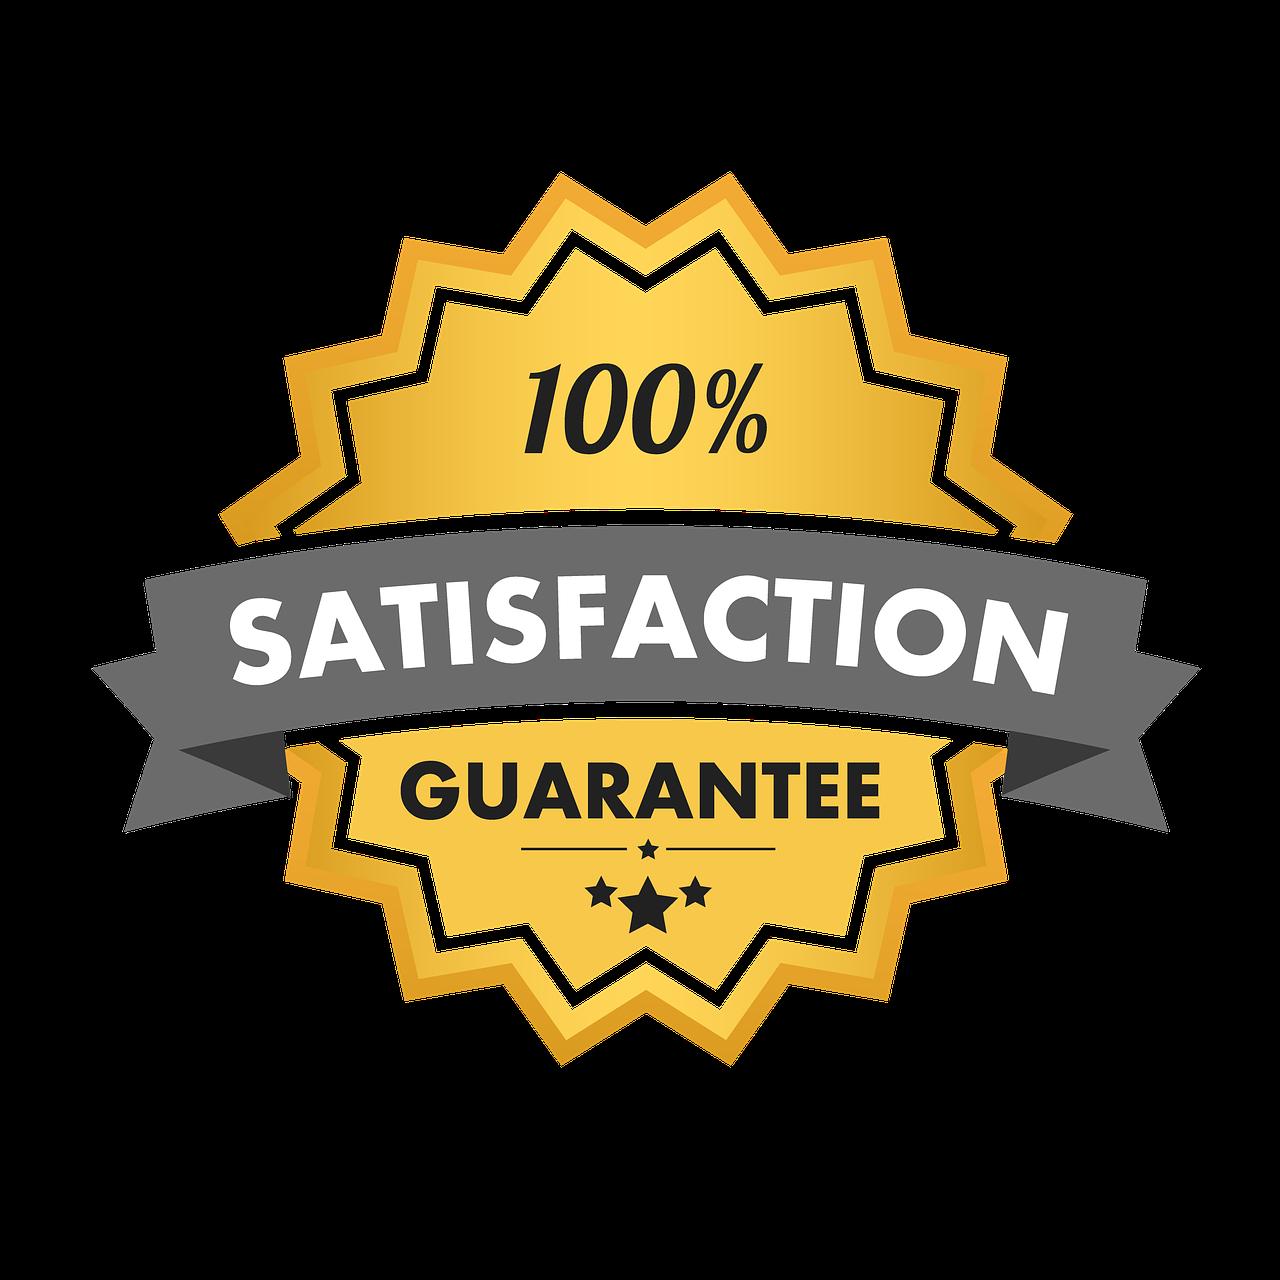 satisfaction guarantee, 100 satisfaction, seal